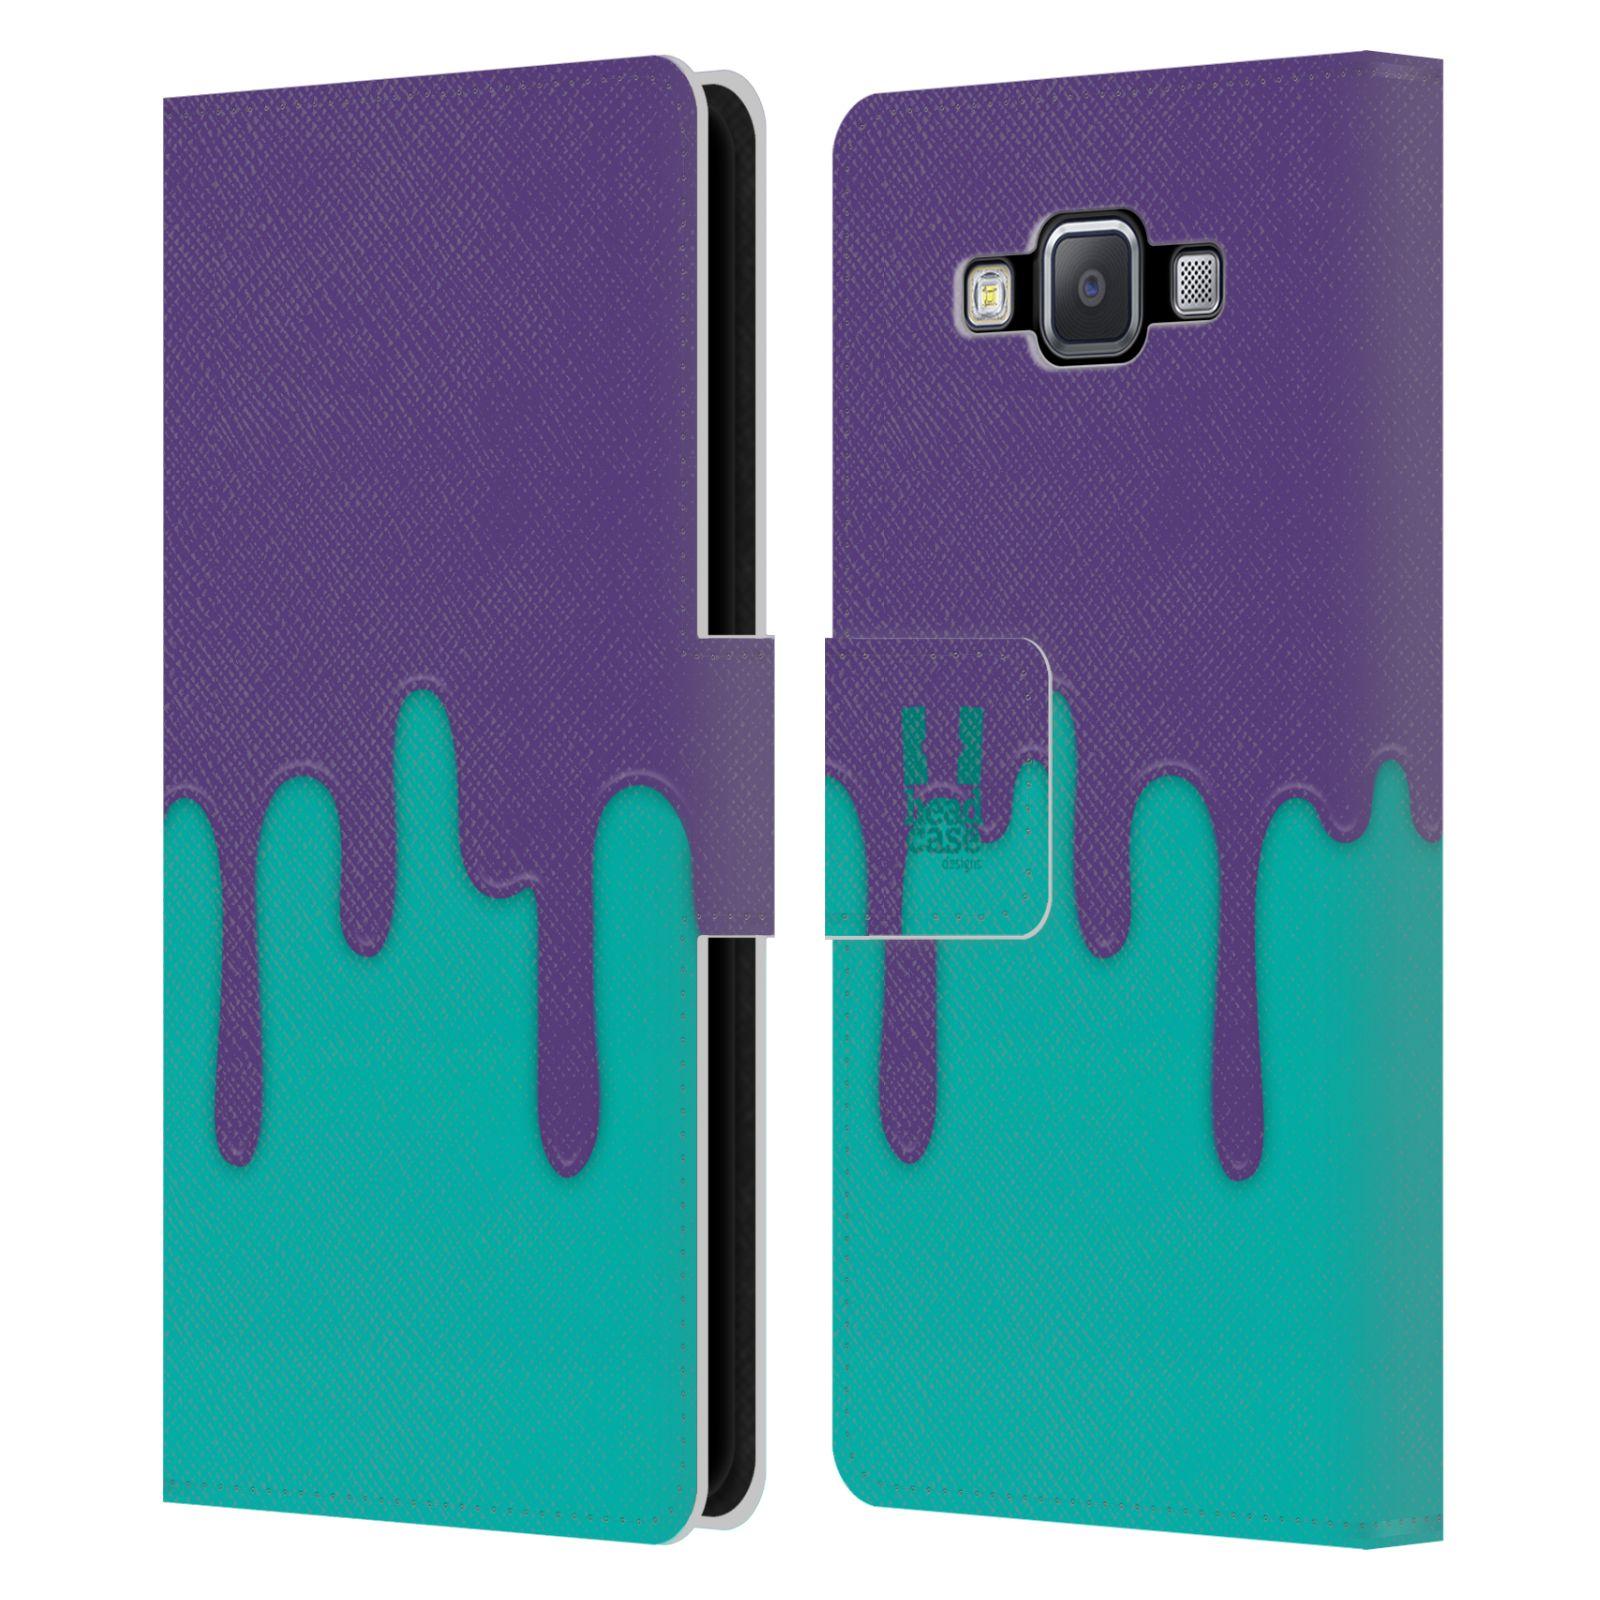 HEAD CASE Flipové pouzdro pro mobil Samsung Galaxy A5 Rozlitá barva fialová a tyrkysová